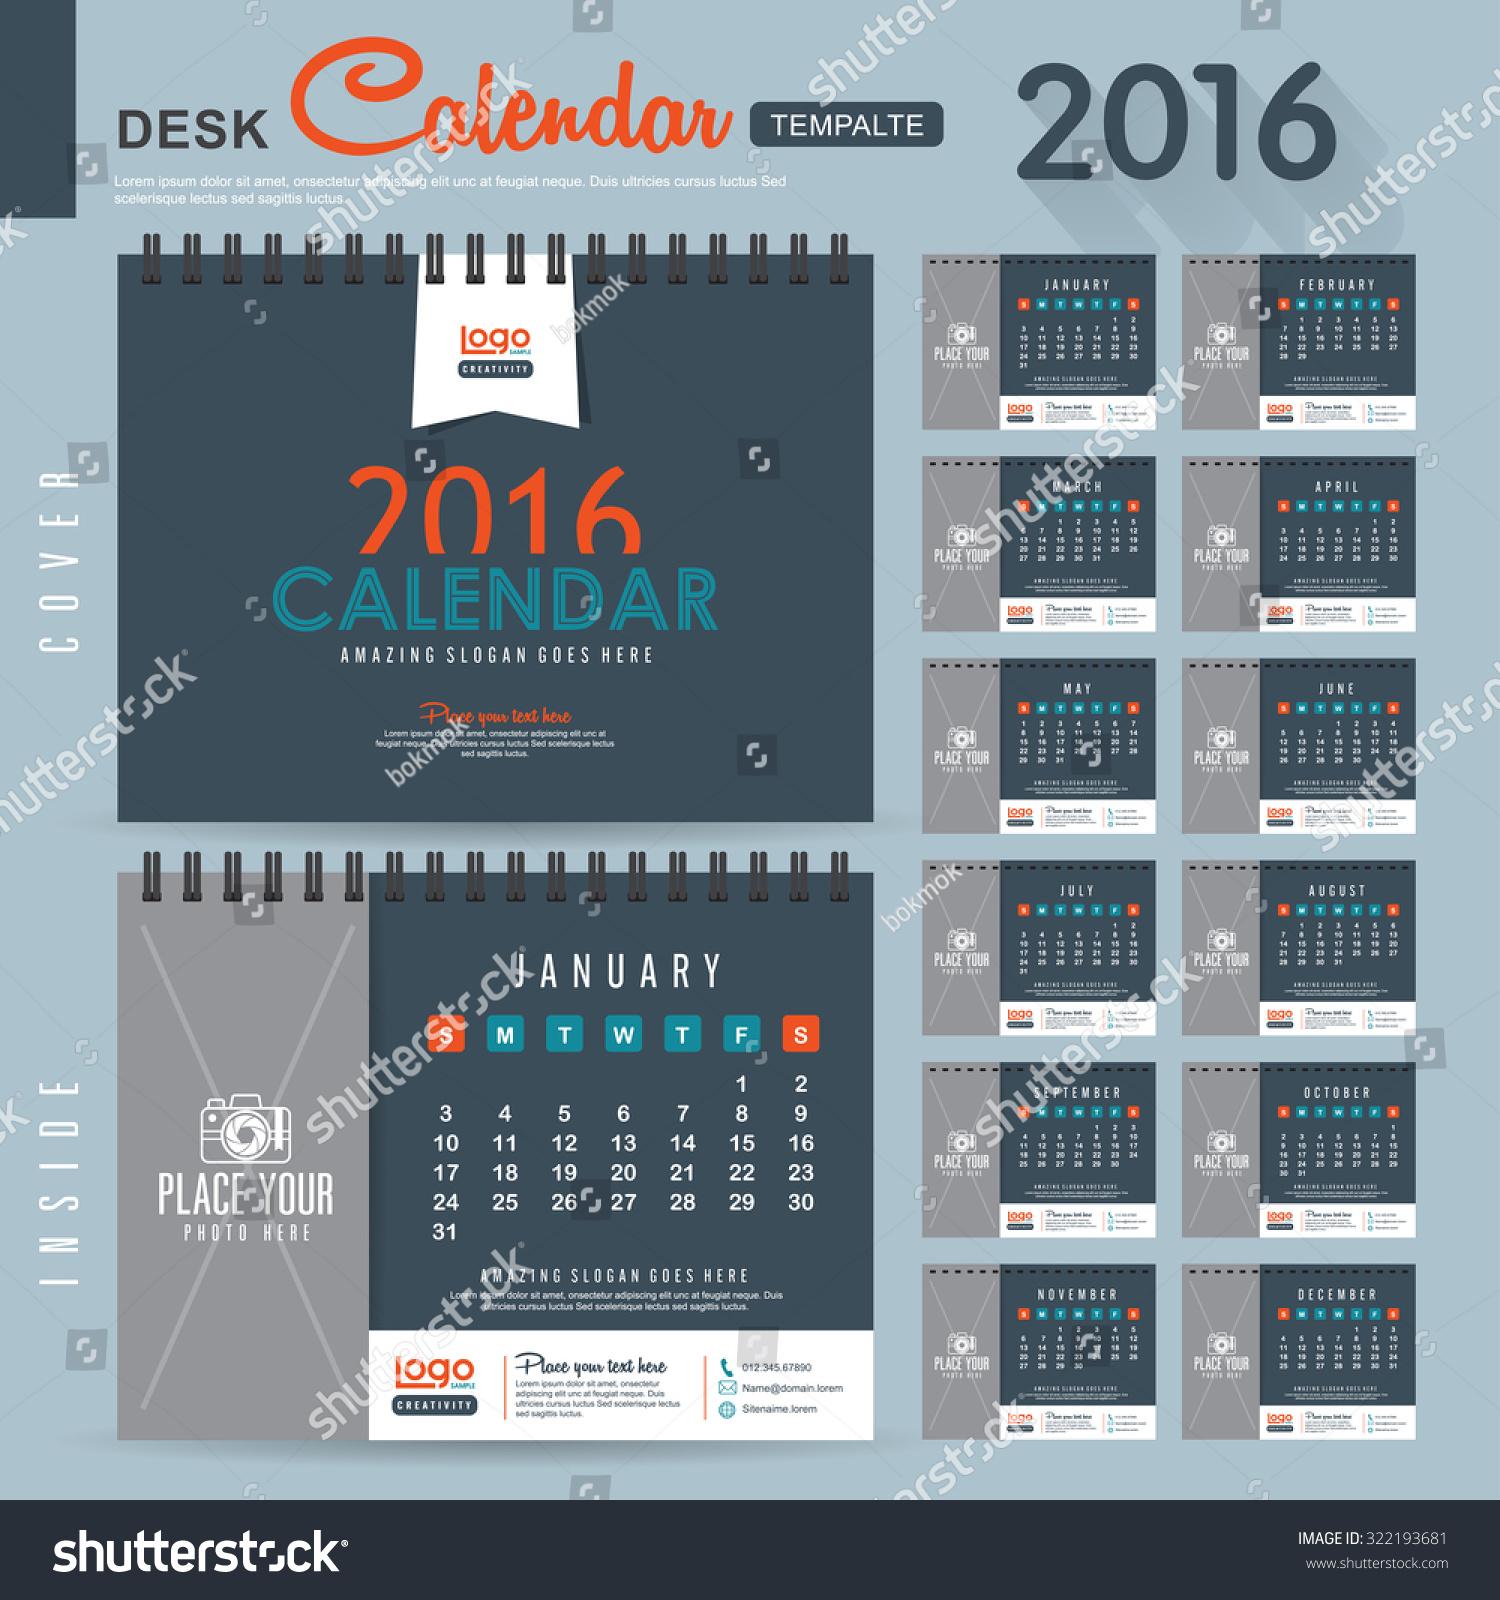 Calendar Design Pattern : Desk calendar vector design template stock